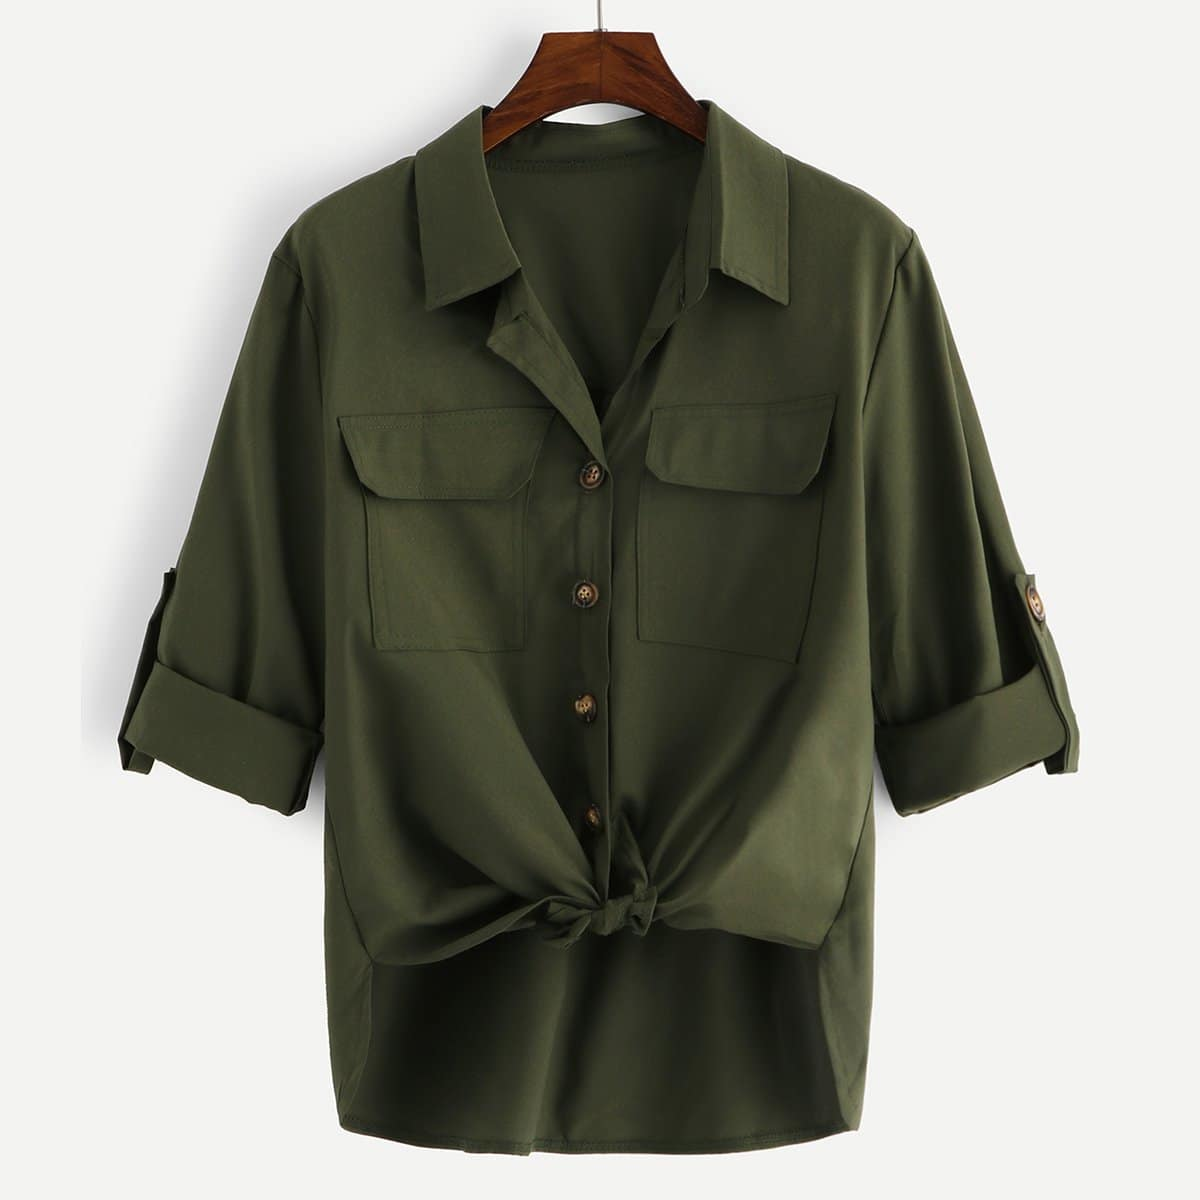 SHEIN / Camisa con bolsillos anudada